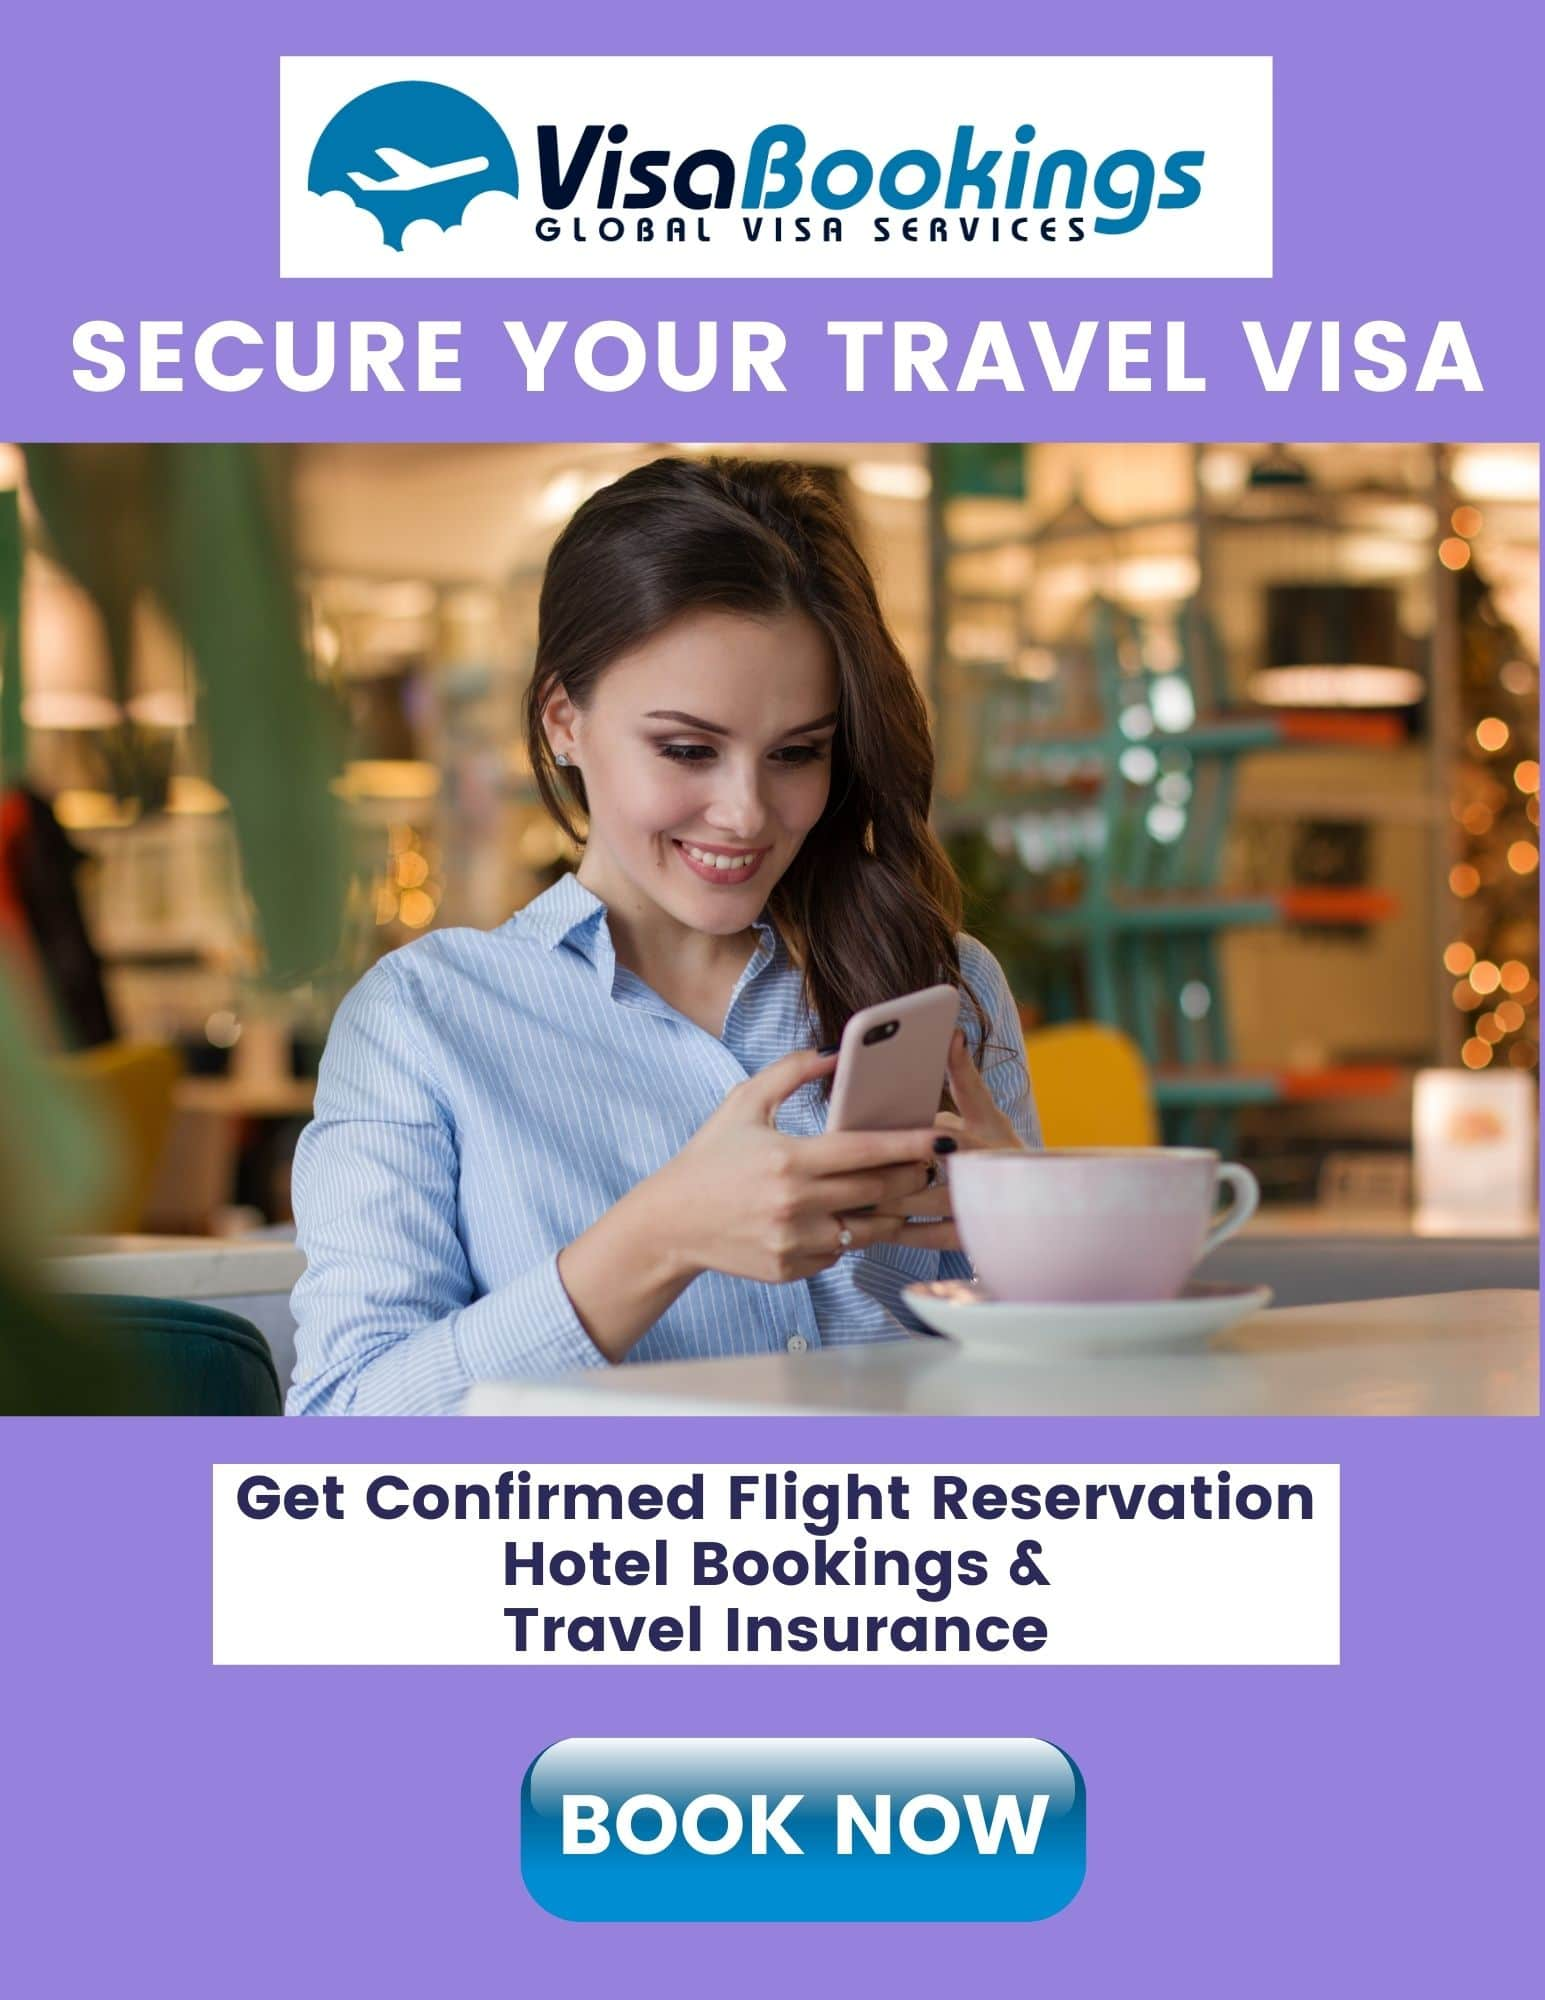 schengen-visa-flight-reservation-hotel-bookings-travel-medical-insurance